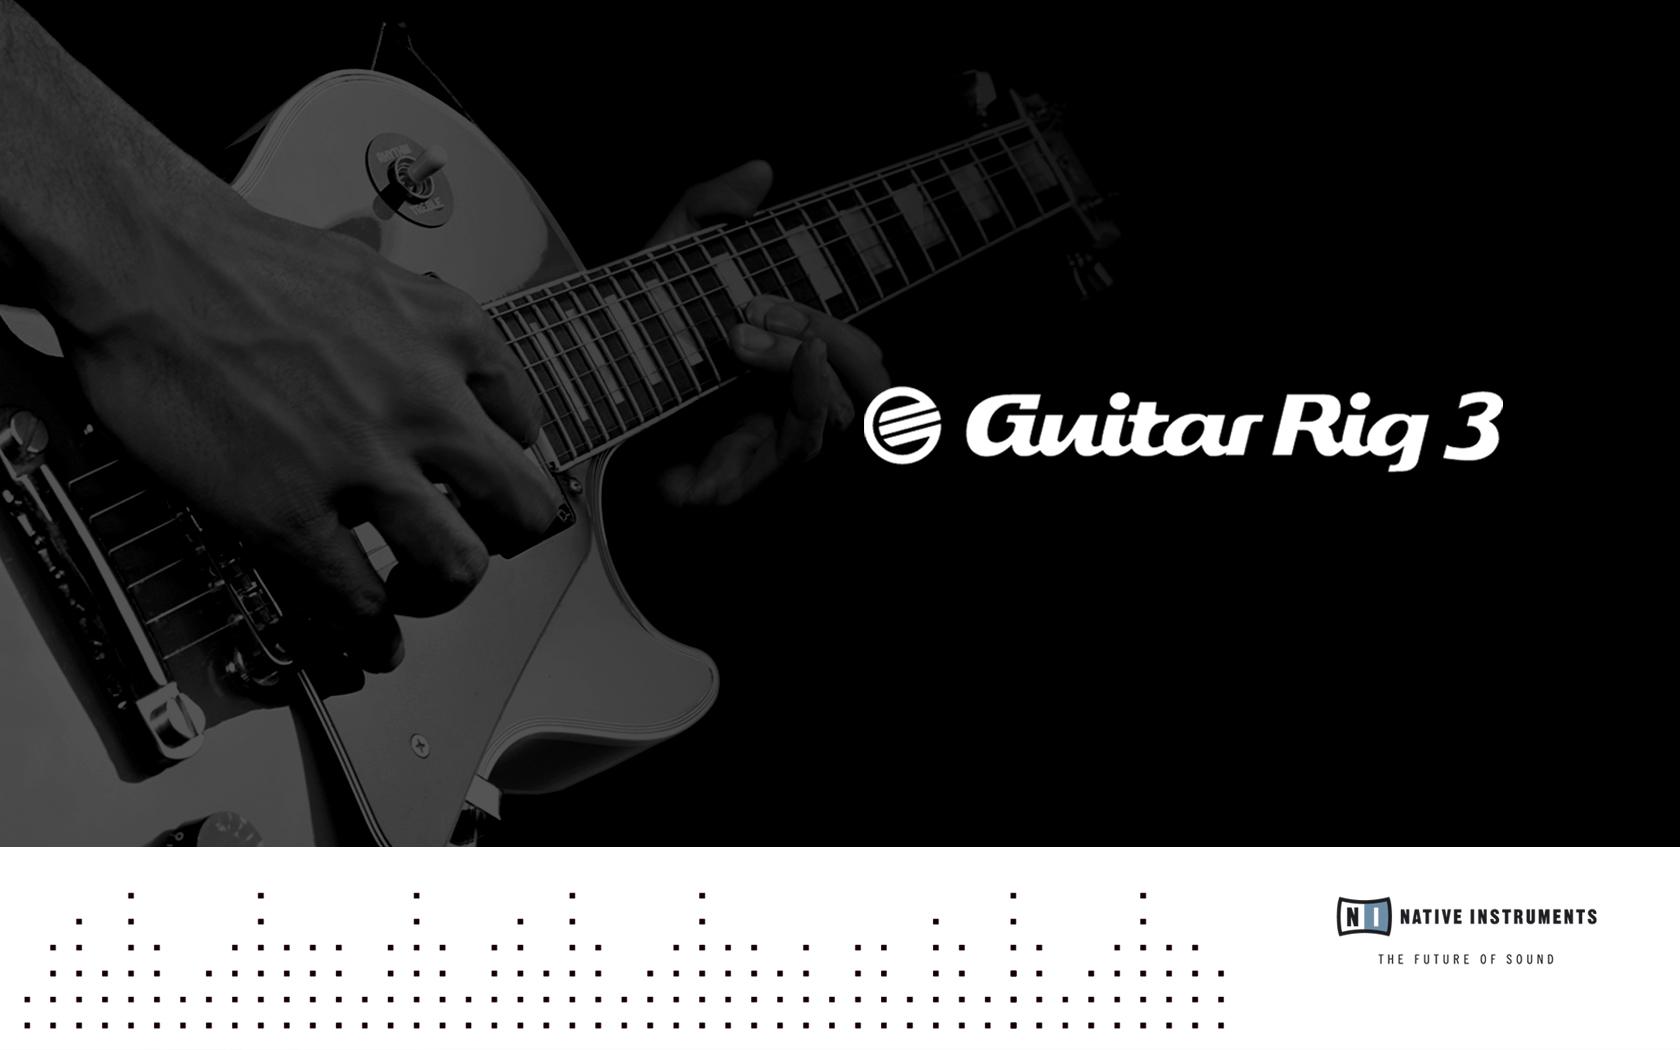 Guitar Rig 3 Native Instruments Wallpaper World Wallpaper Collection 1680x1050